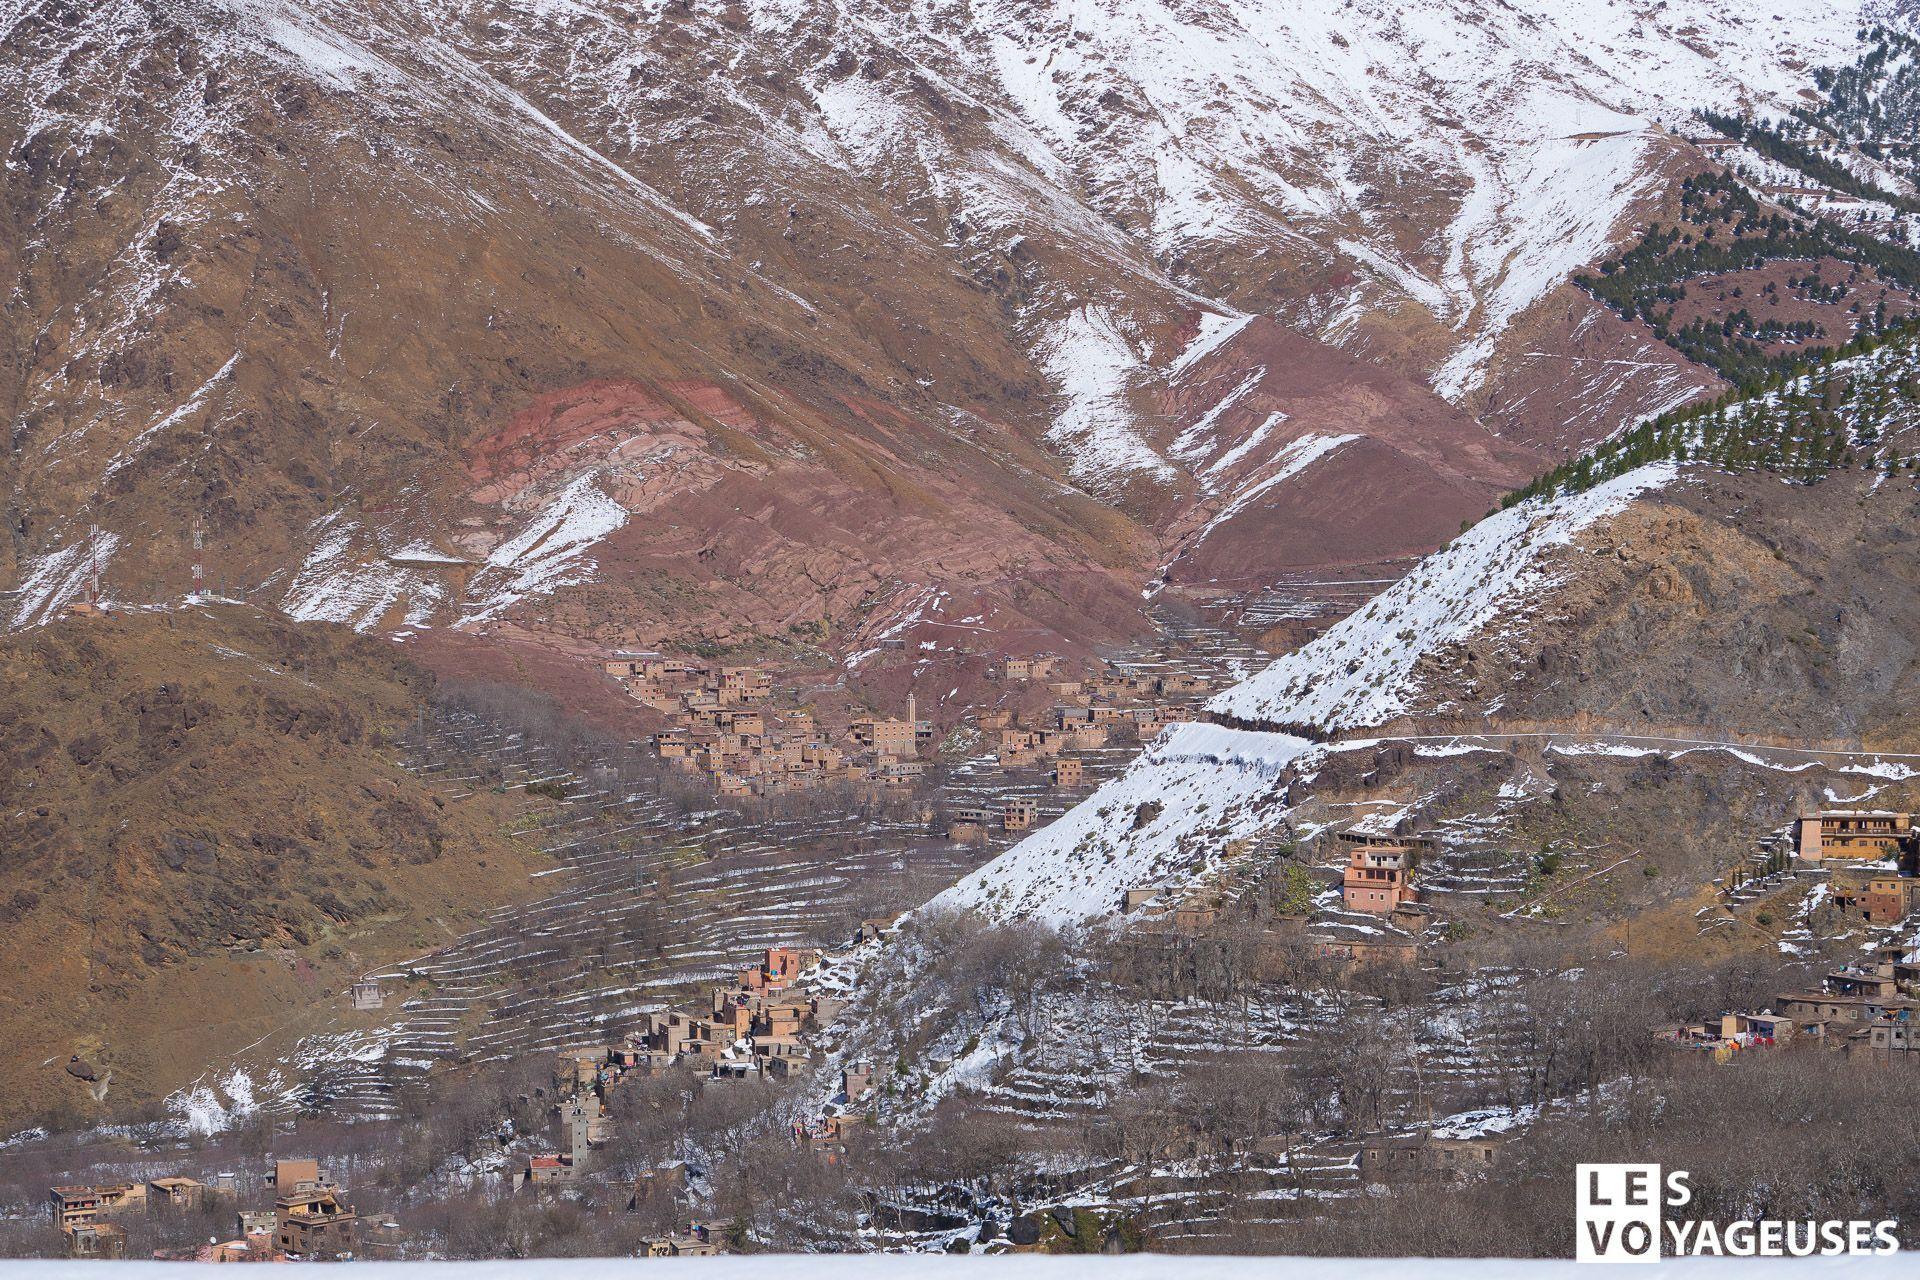 Les-voyageuses-maroc-imlil-hiver-09996